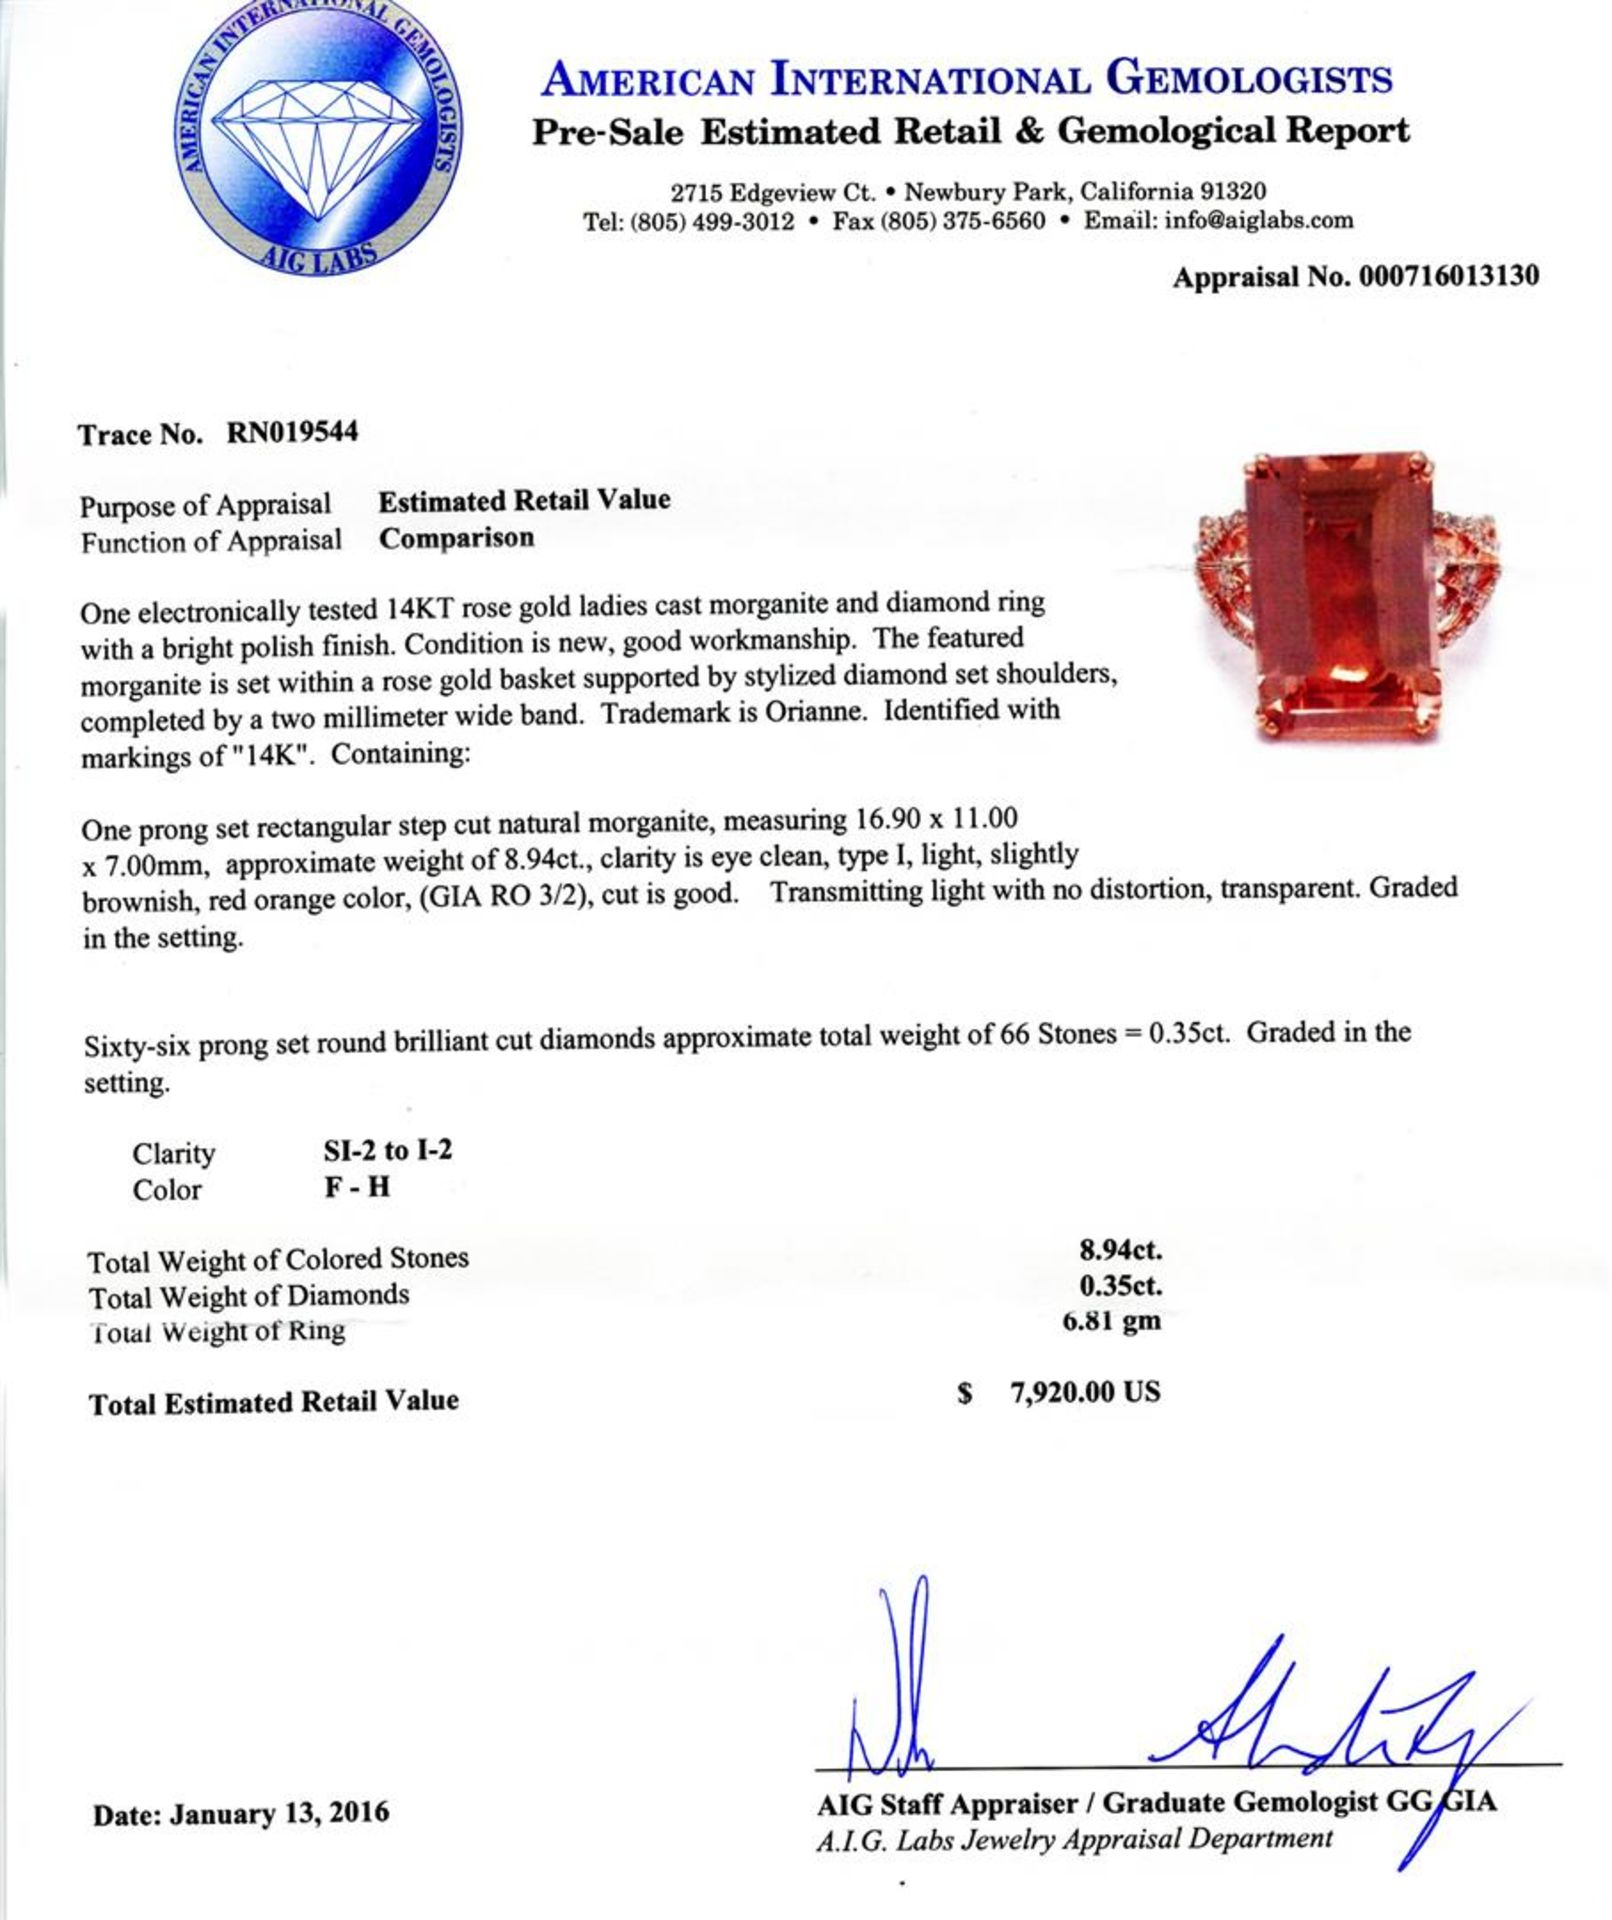 8.94ct Morganite and 0.35ctw Diamond 14K Rose Gold Ring - Image 4 of 4